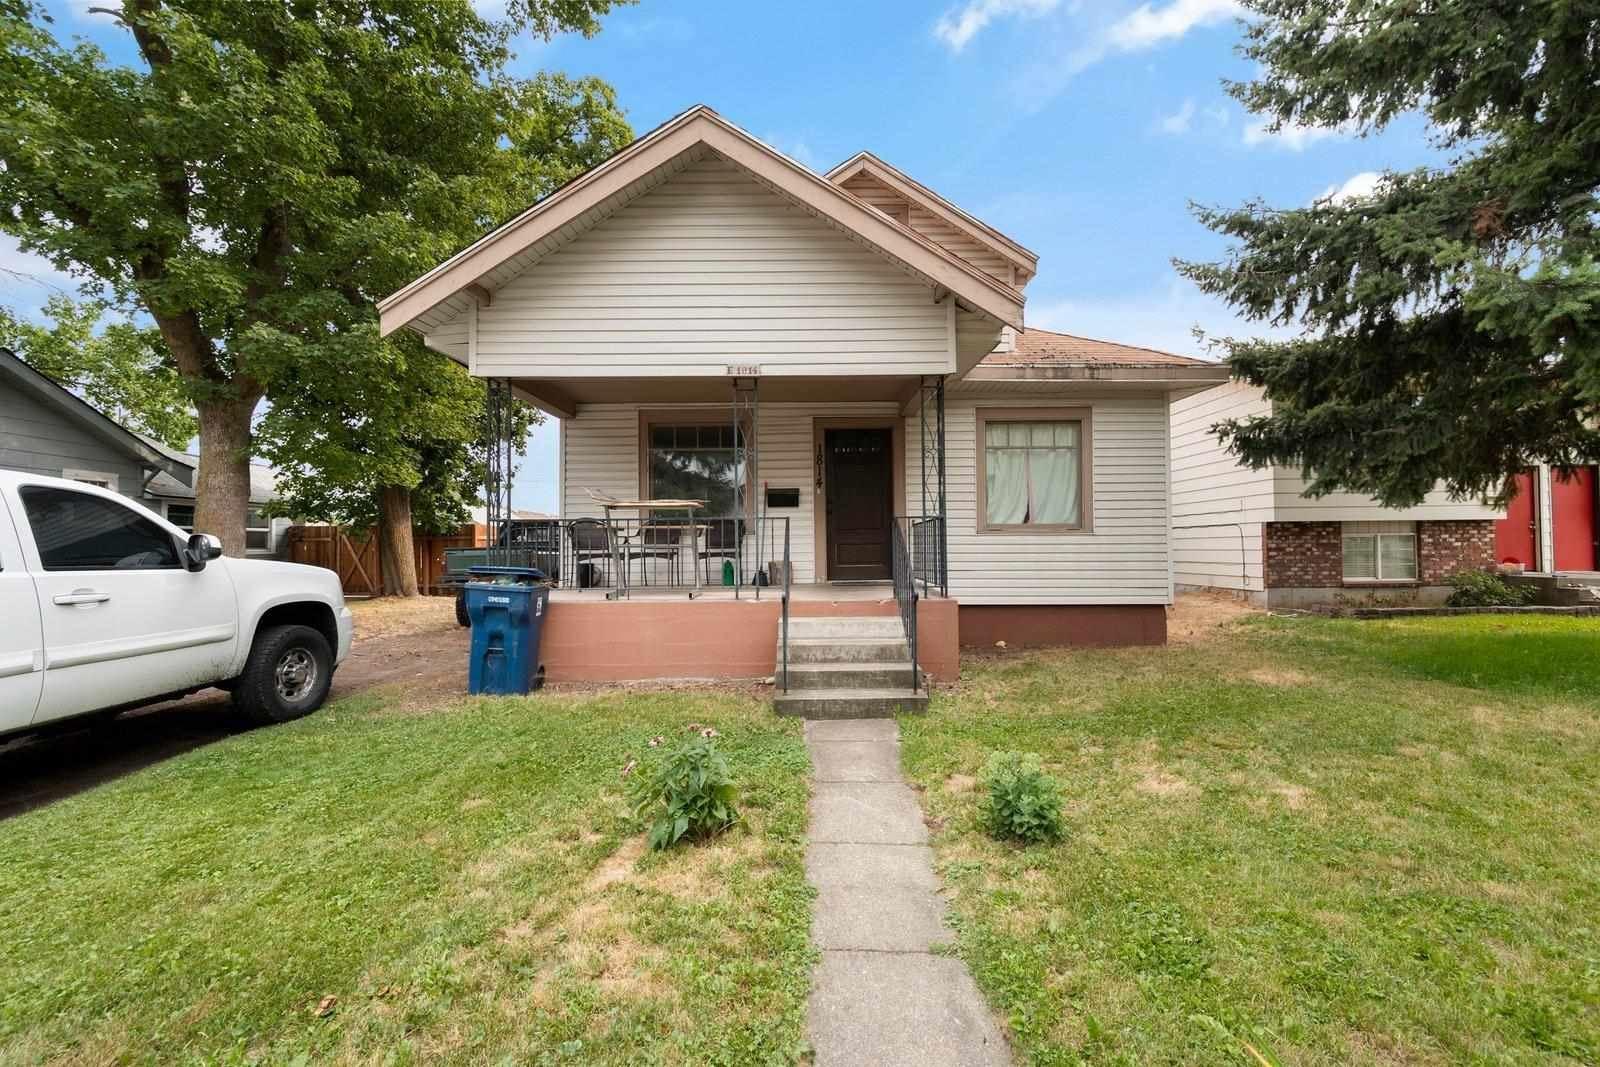 1814 E Sharp Ave, Spokane, WA 99202 - #: 202119352